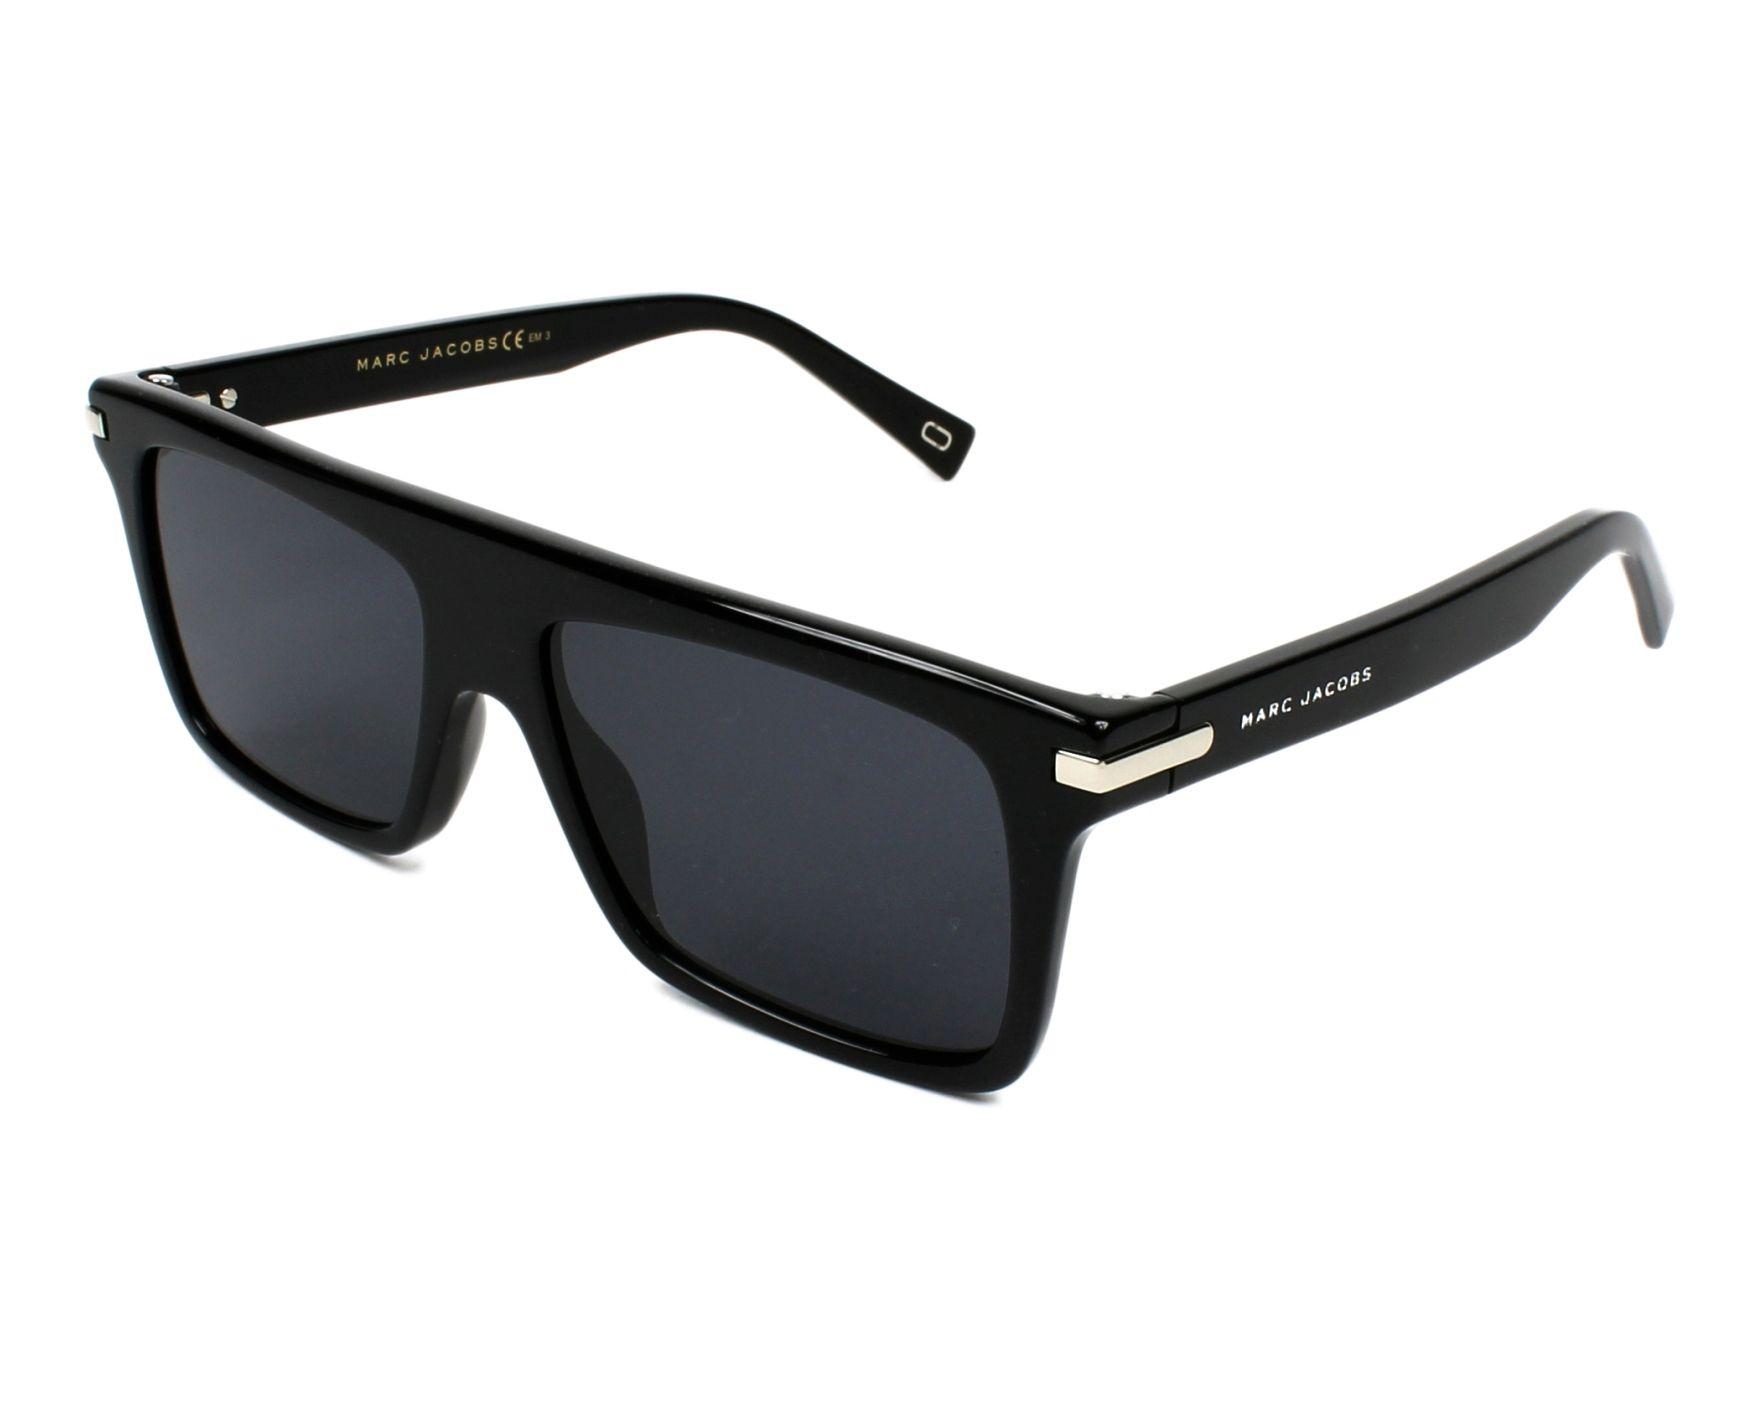 7020a1504c Gafas de sol Marc Jacobs MARC-186-S 807/IR 54-16